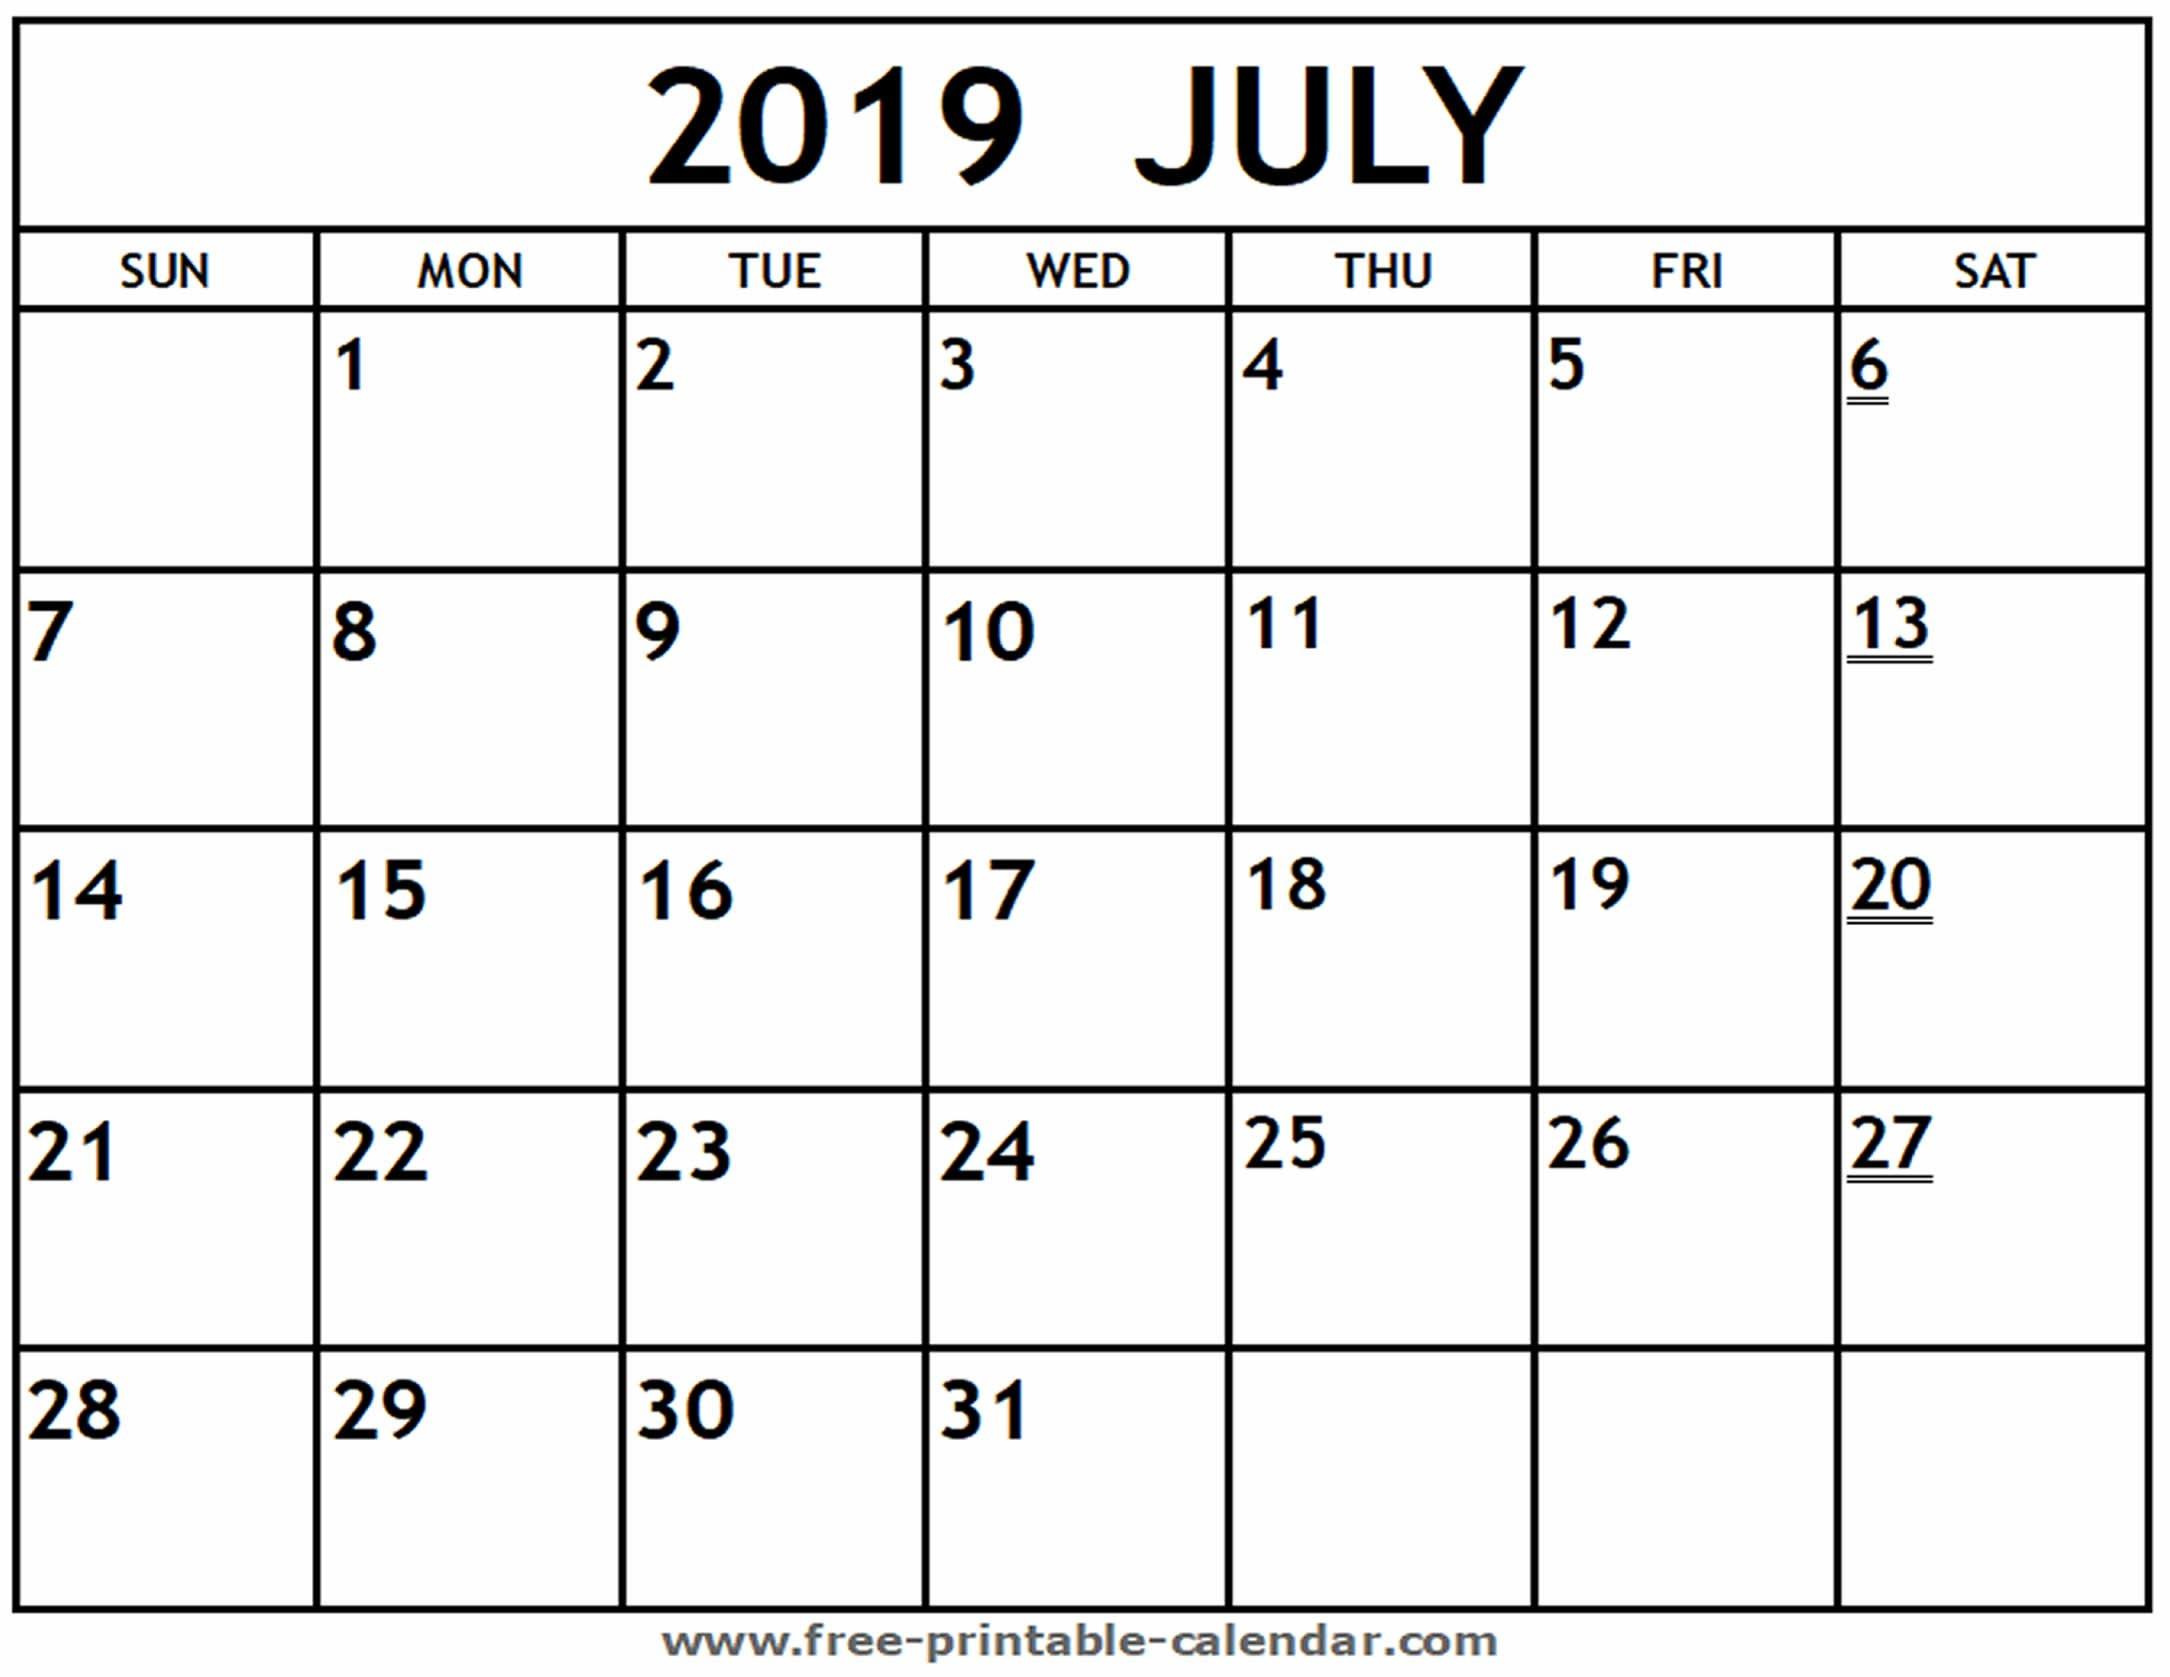 Printable 2019 July Calendar – Free Printable Calendar Calendar 2019 July